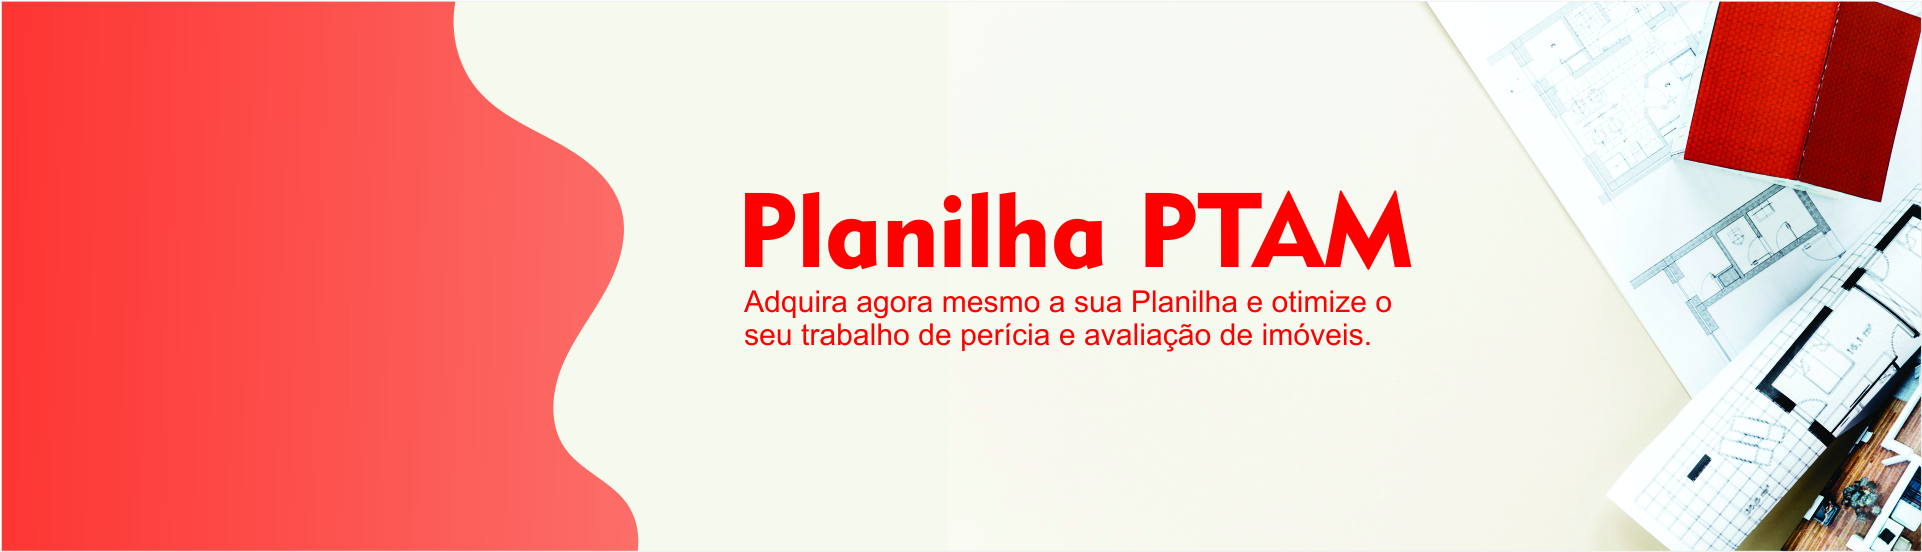 banner planilha